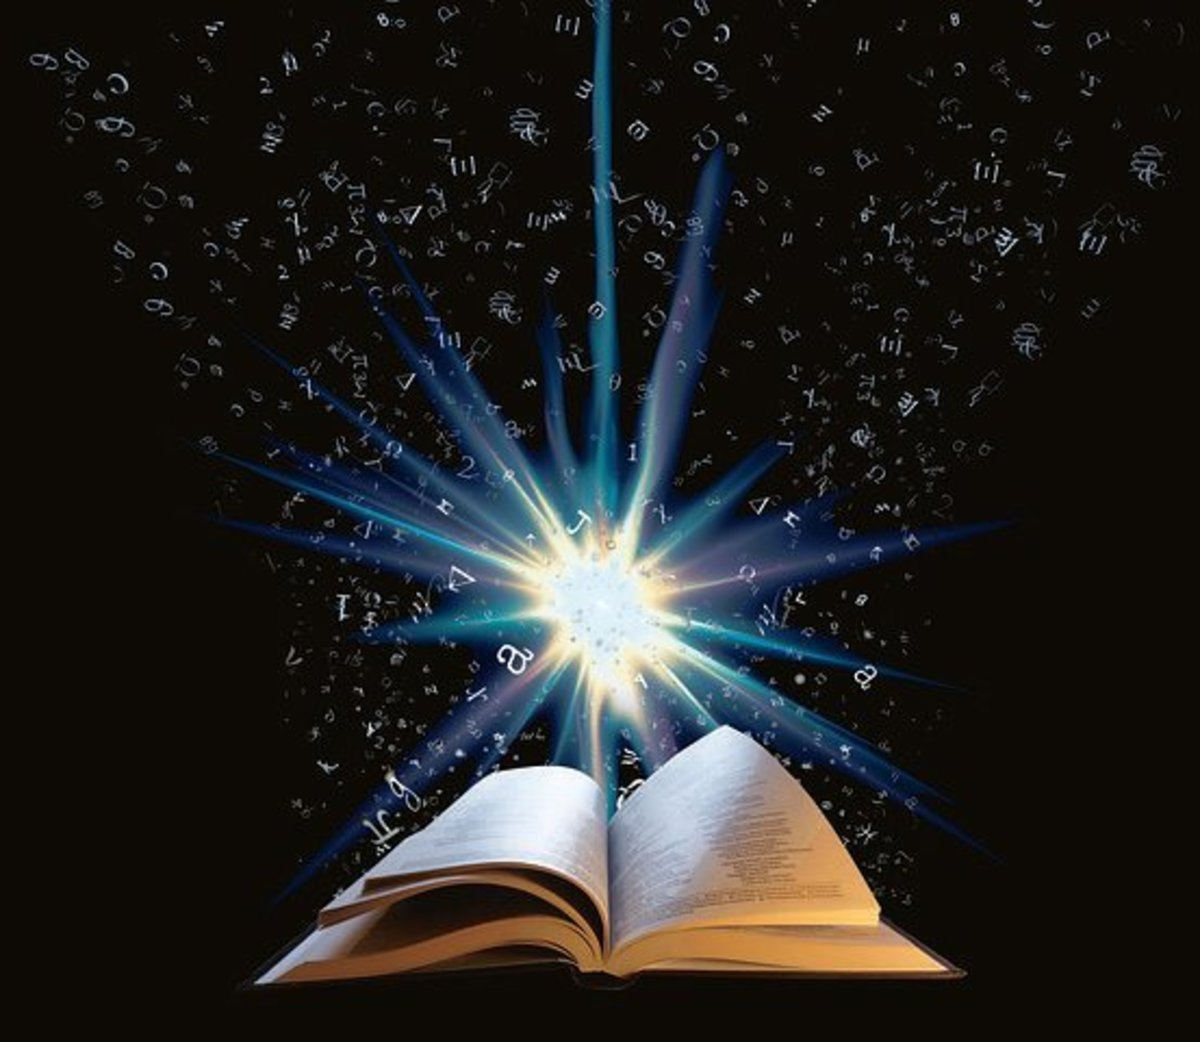 the-light-of-gods-word